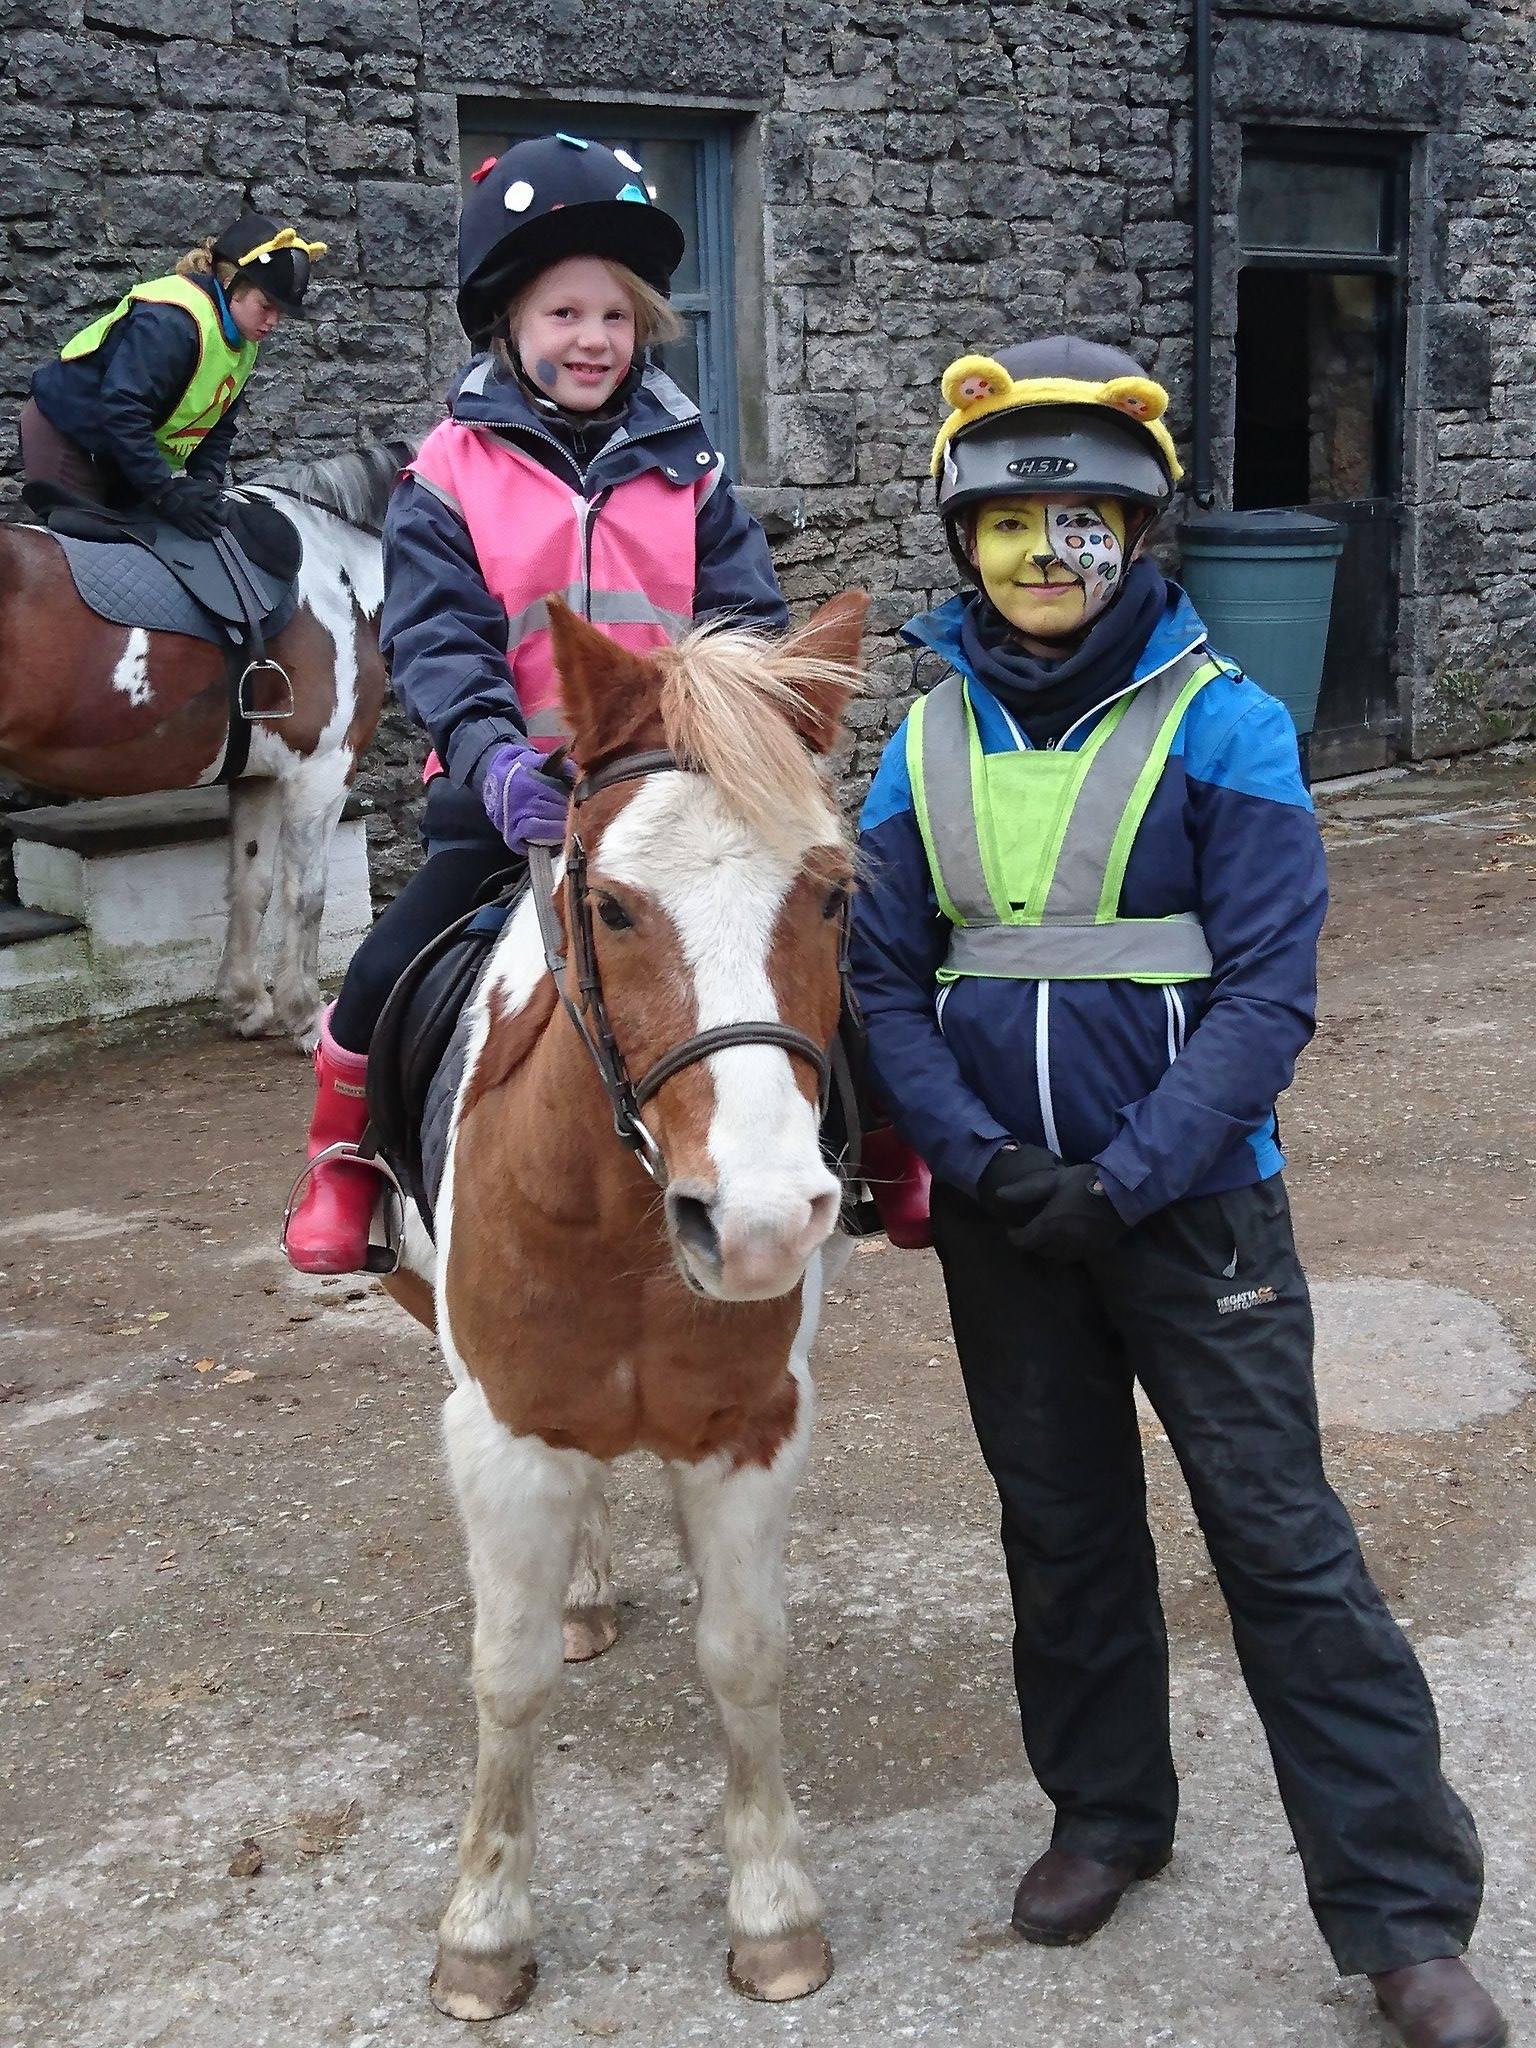 Hoof Centre Raises Funds For Children In Need The Gaitpost